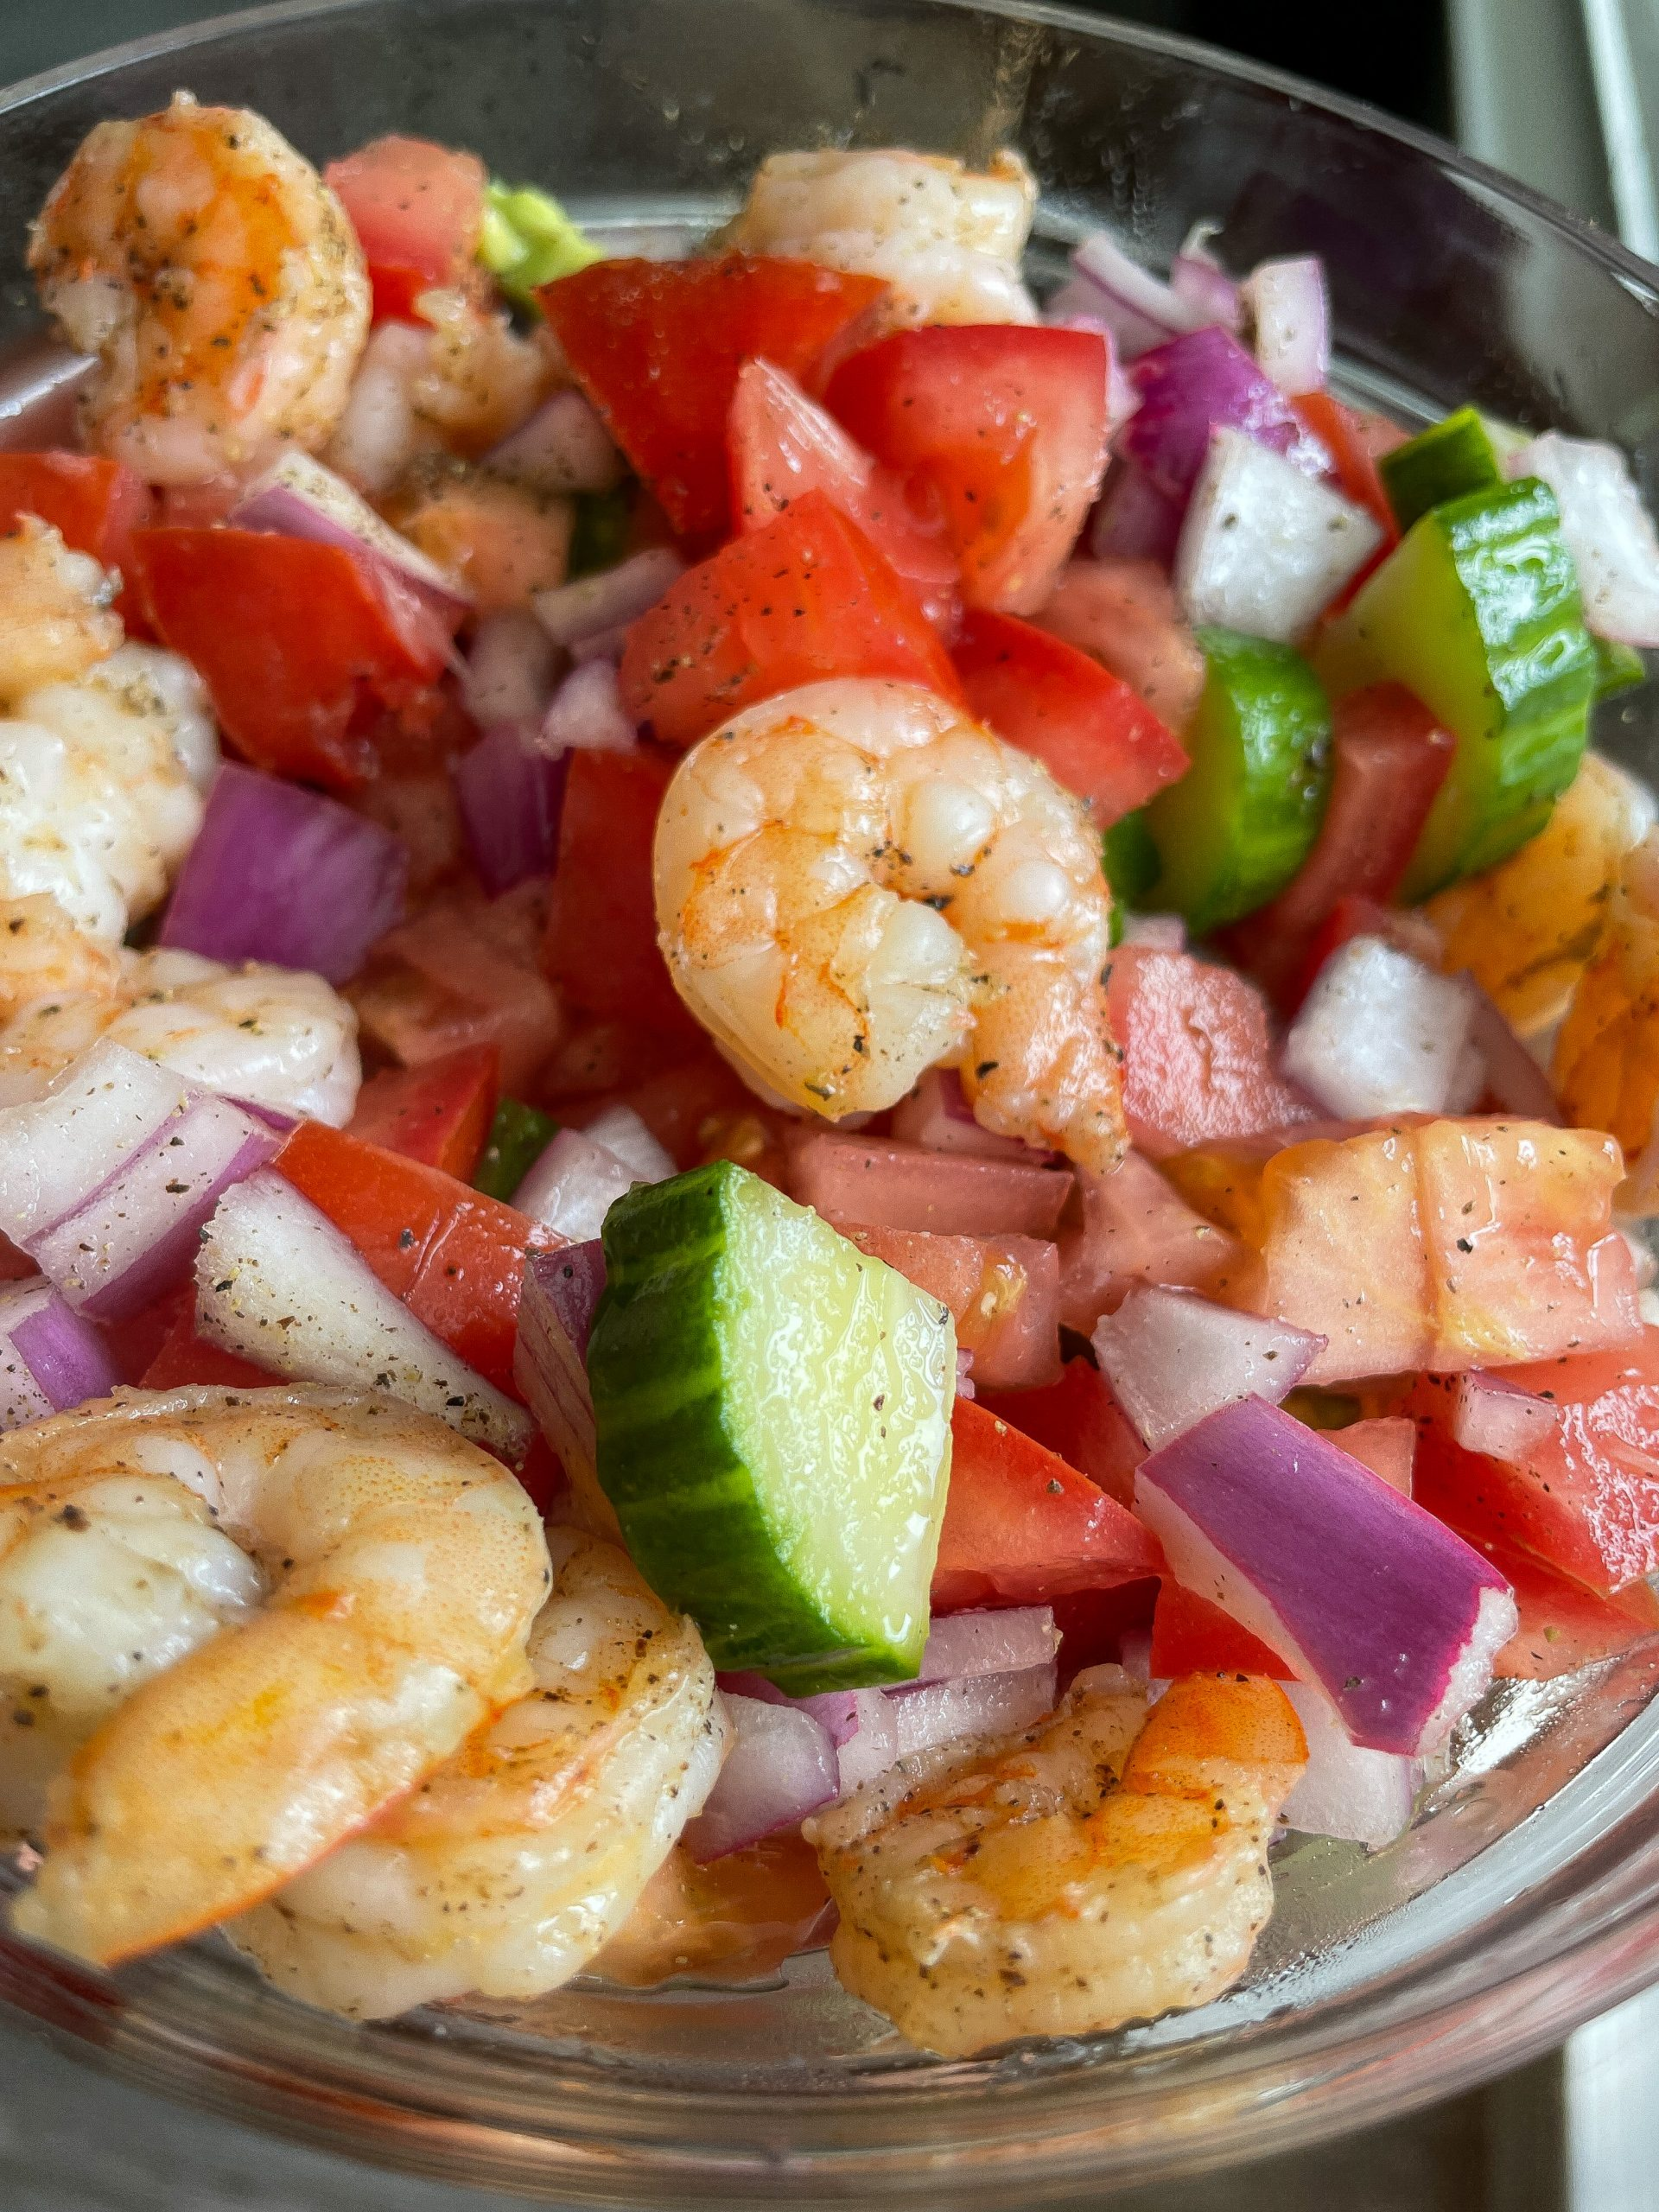 Low carb salad recipe